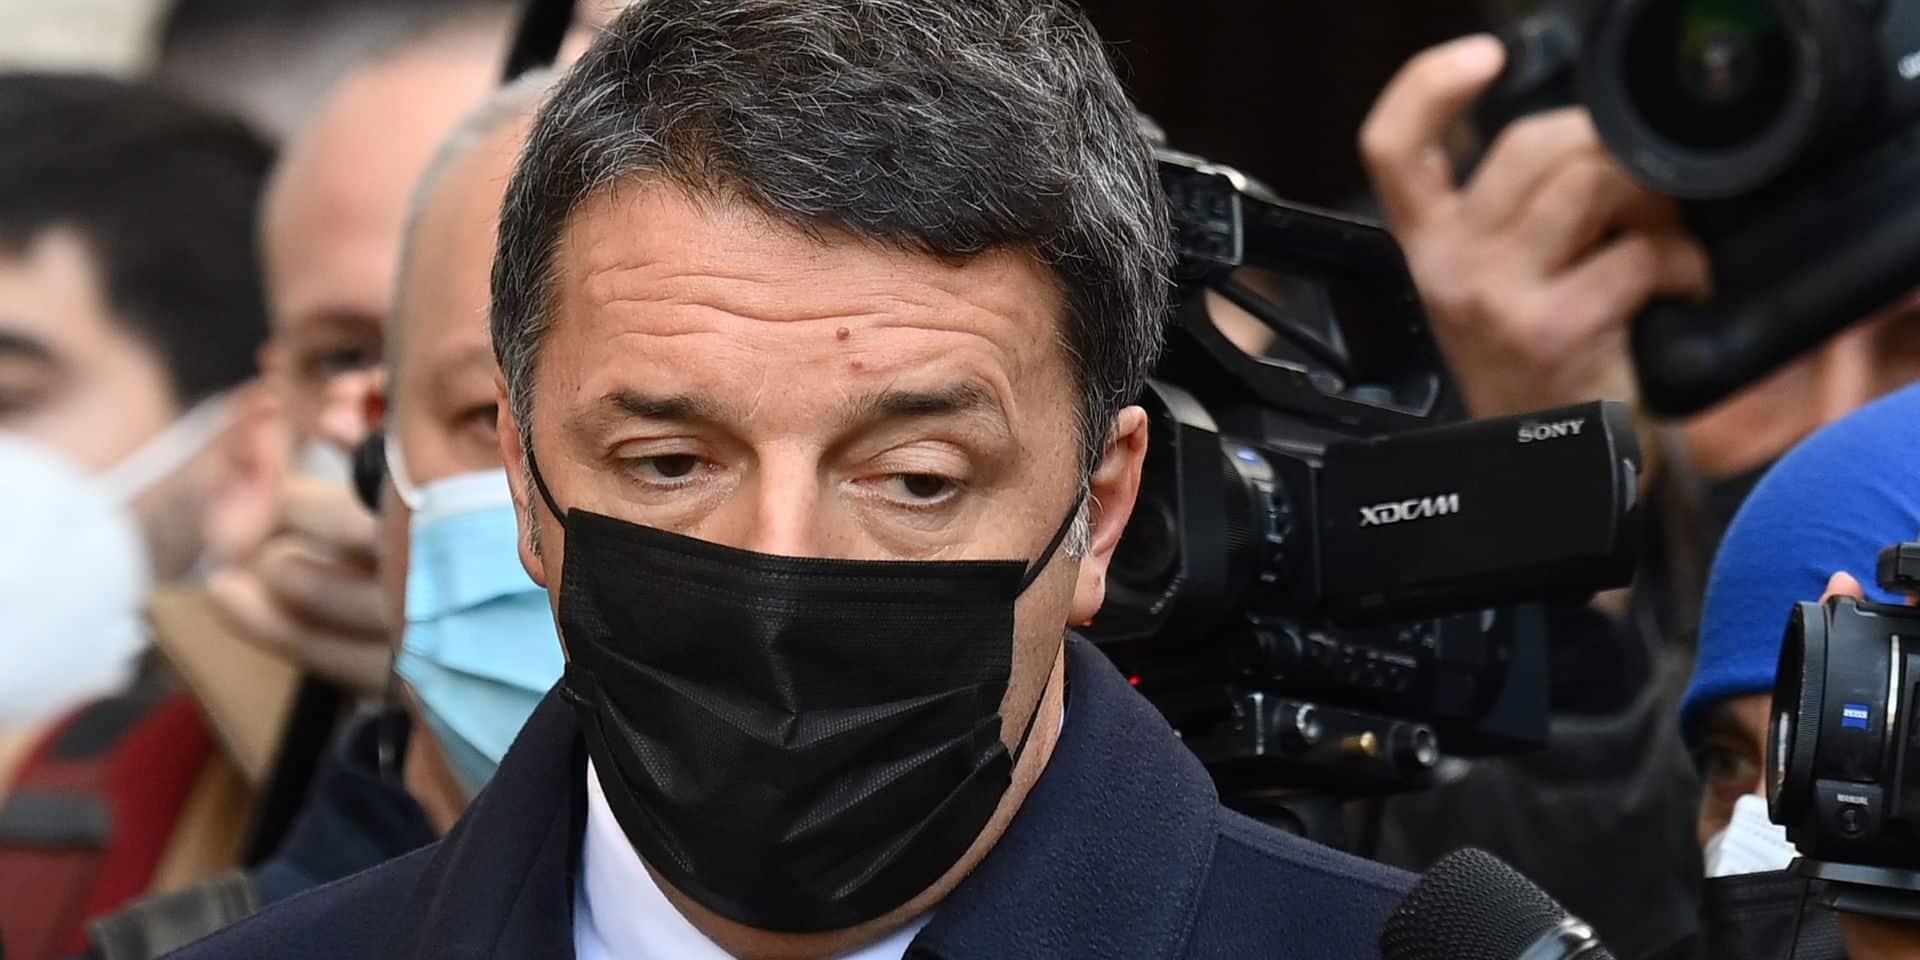 Matteo Renzi a reçu une enveloppe avec deux balles